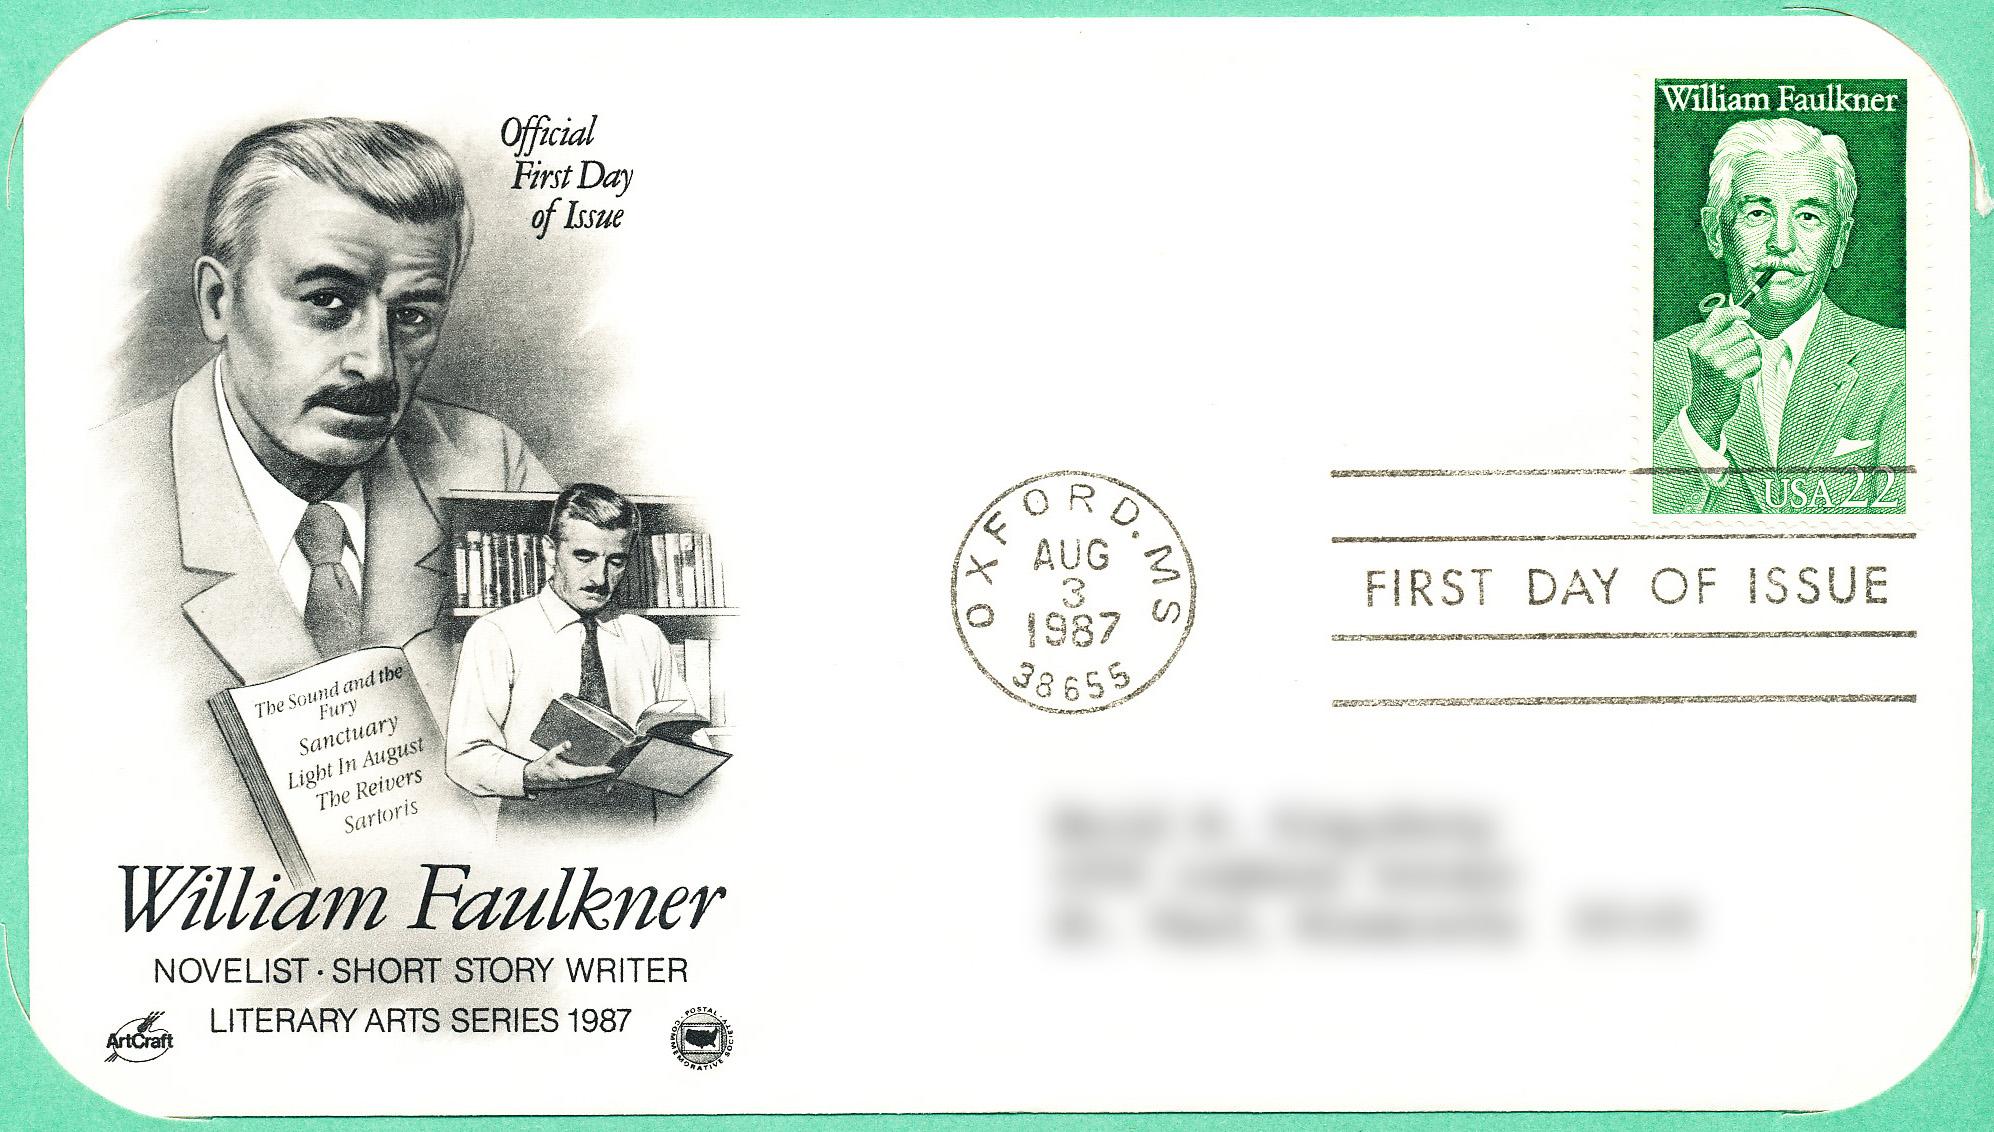 009 Williamfaulknerstamp William Faulkner Essays Essay Stunning Topics Full